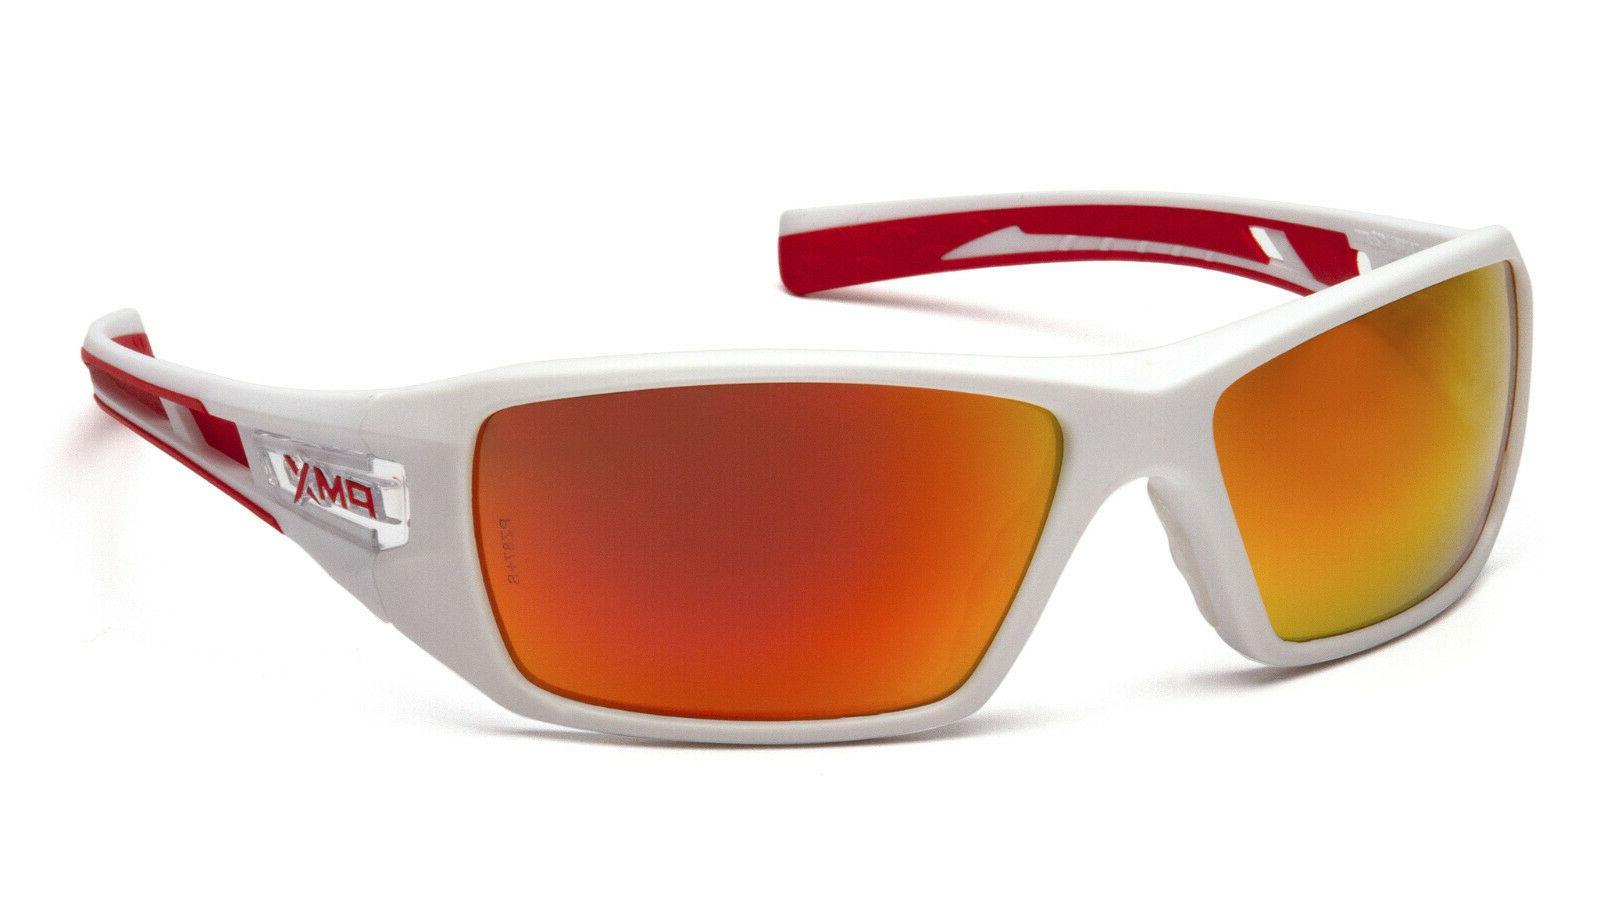 velar safety glasses sunglasses work eyewear white